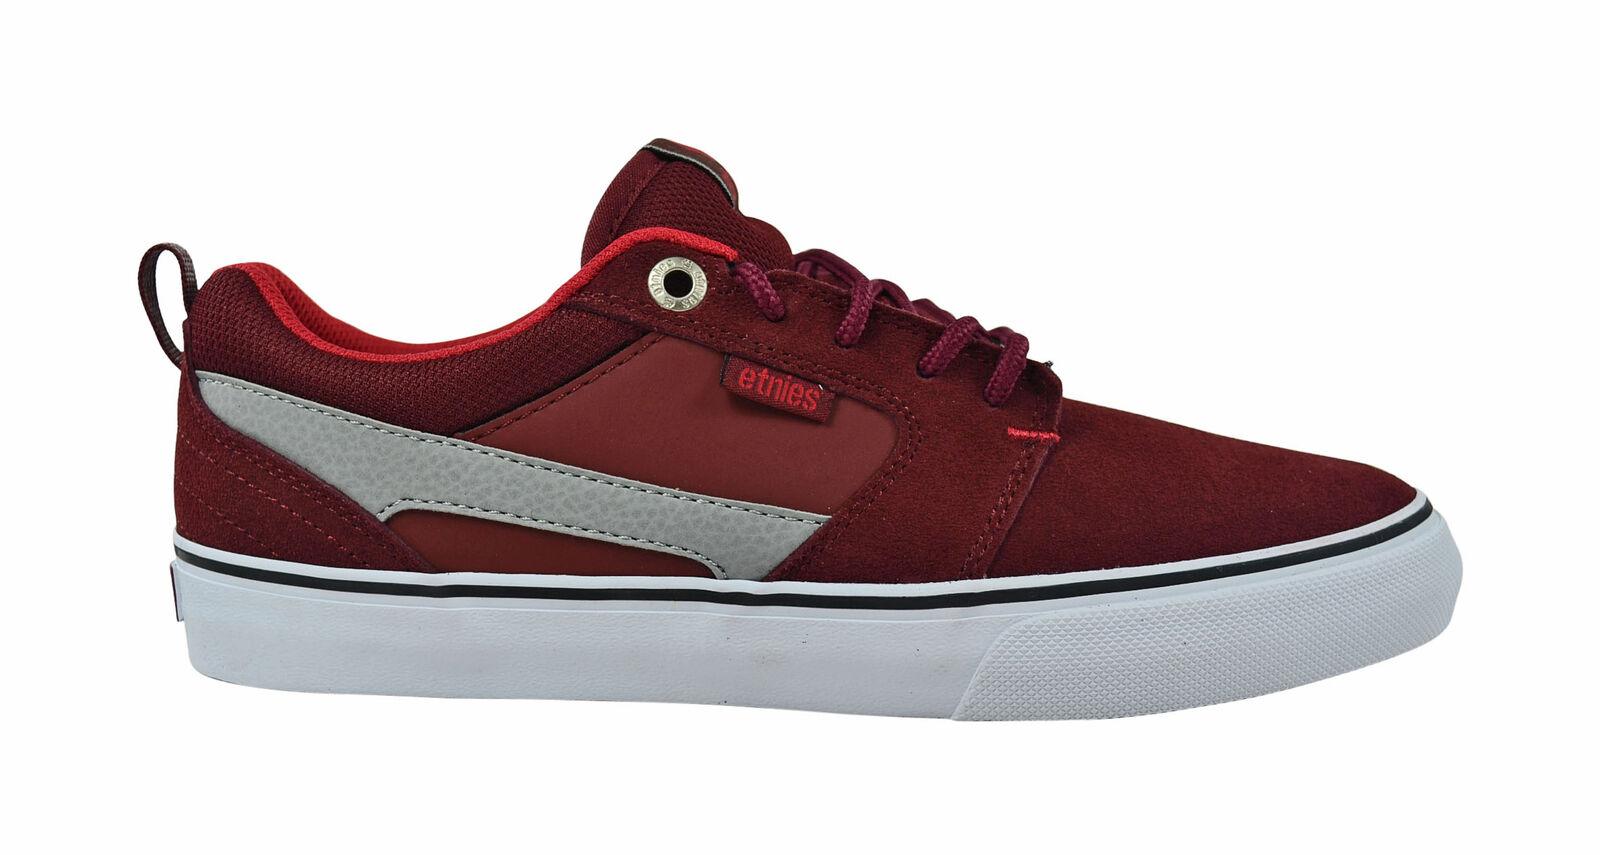 Etnies RAP CT maroon Skater Schuhe/Turnschuhe rot